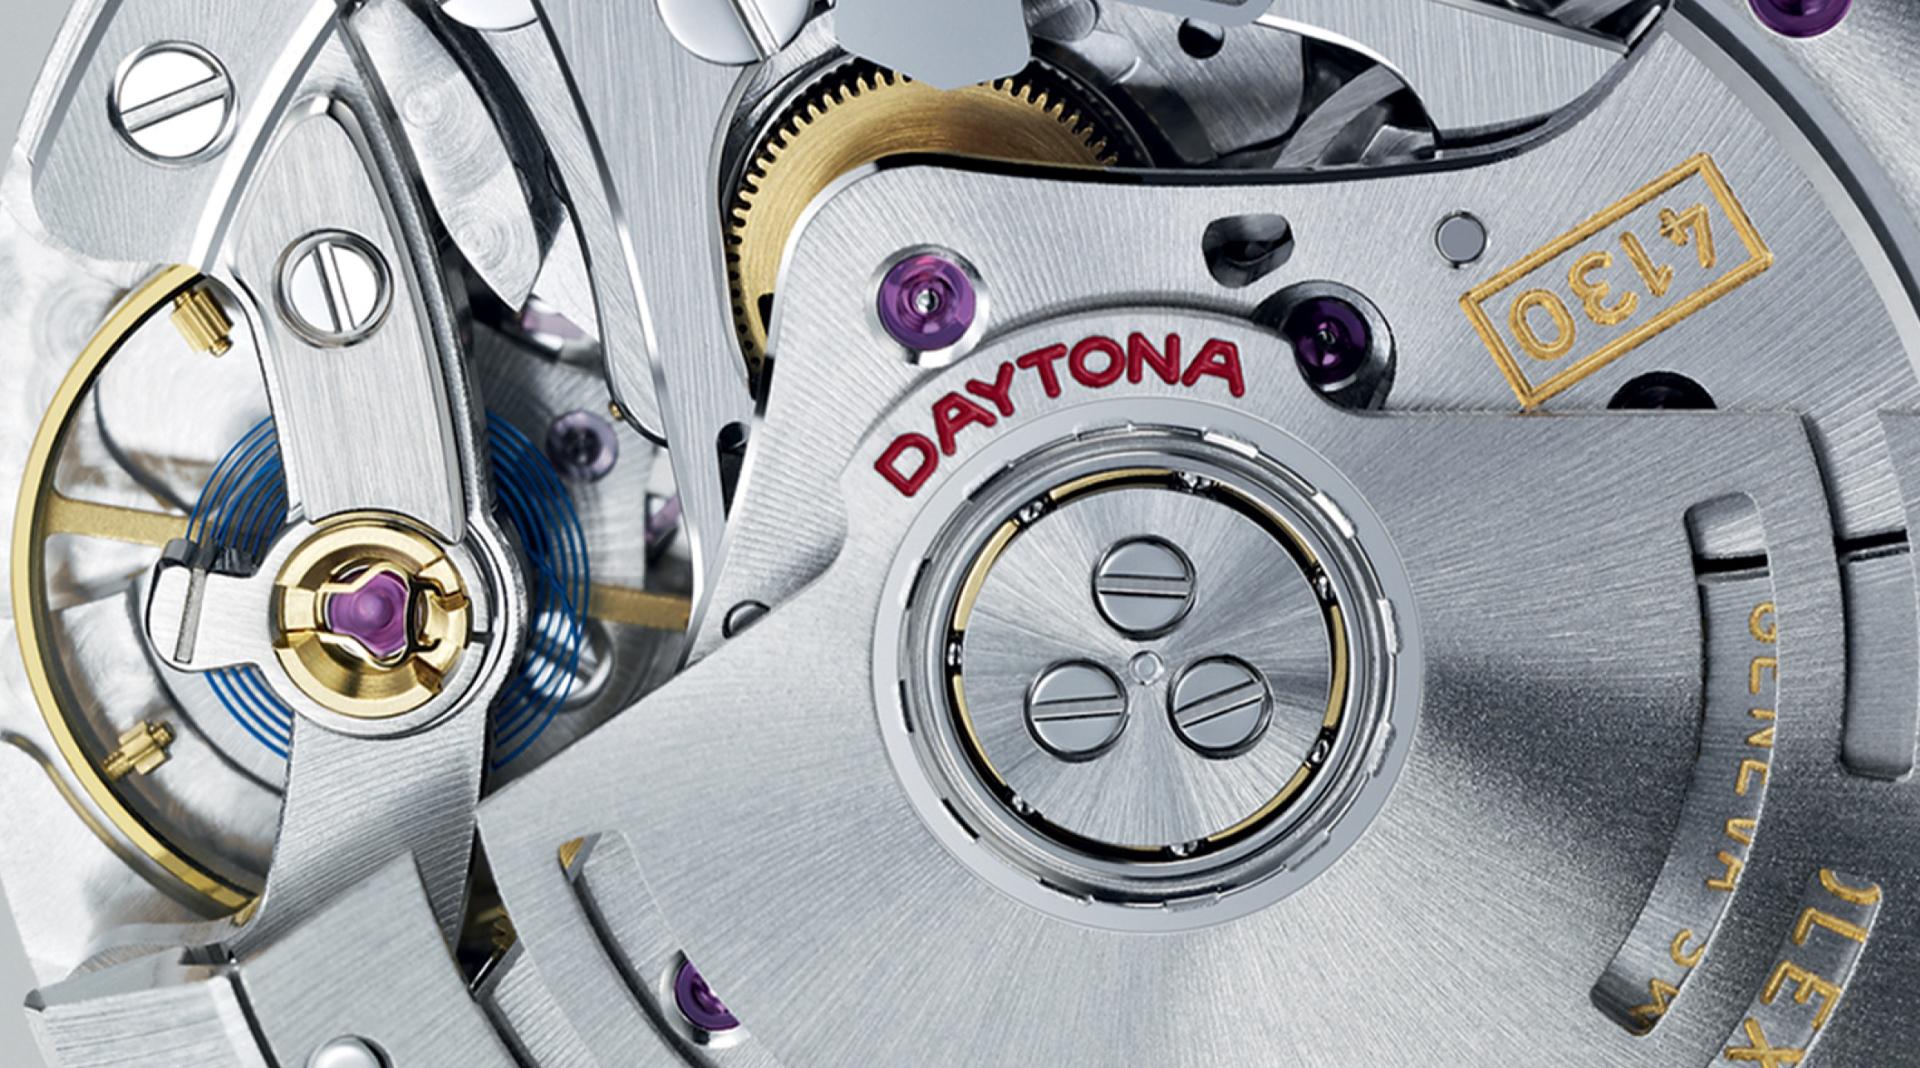 Rolex Cosmograph Daytona movement 4130